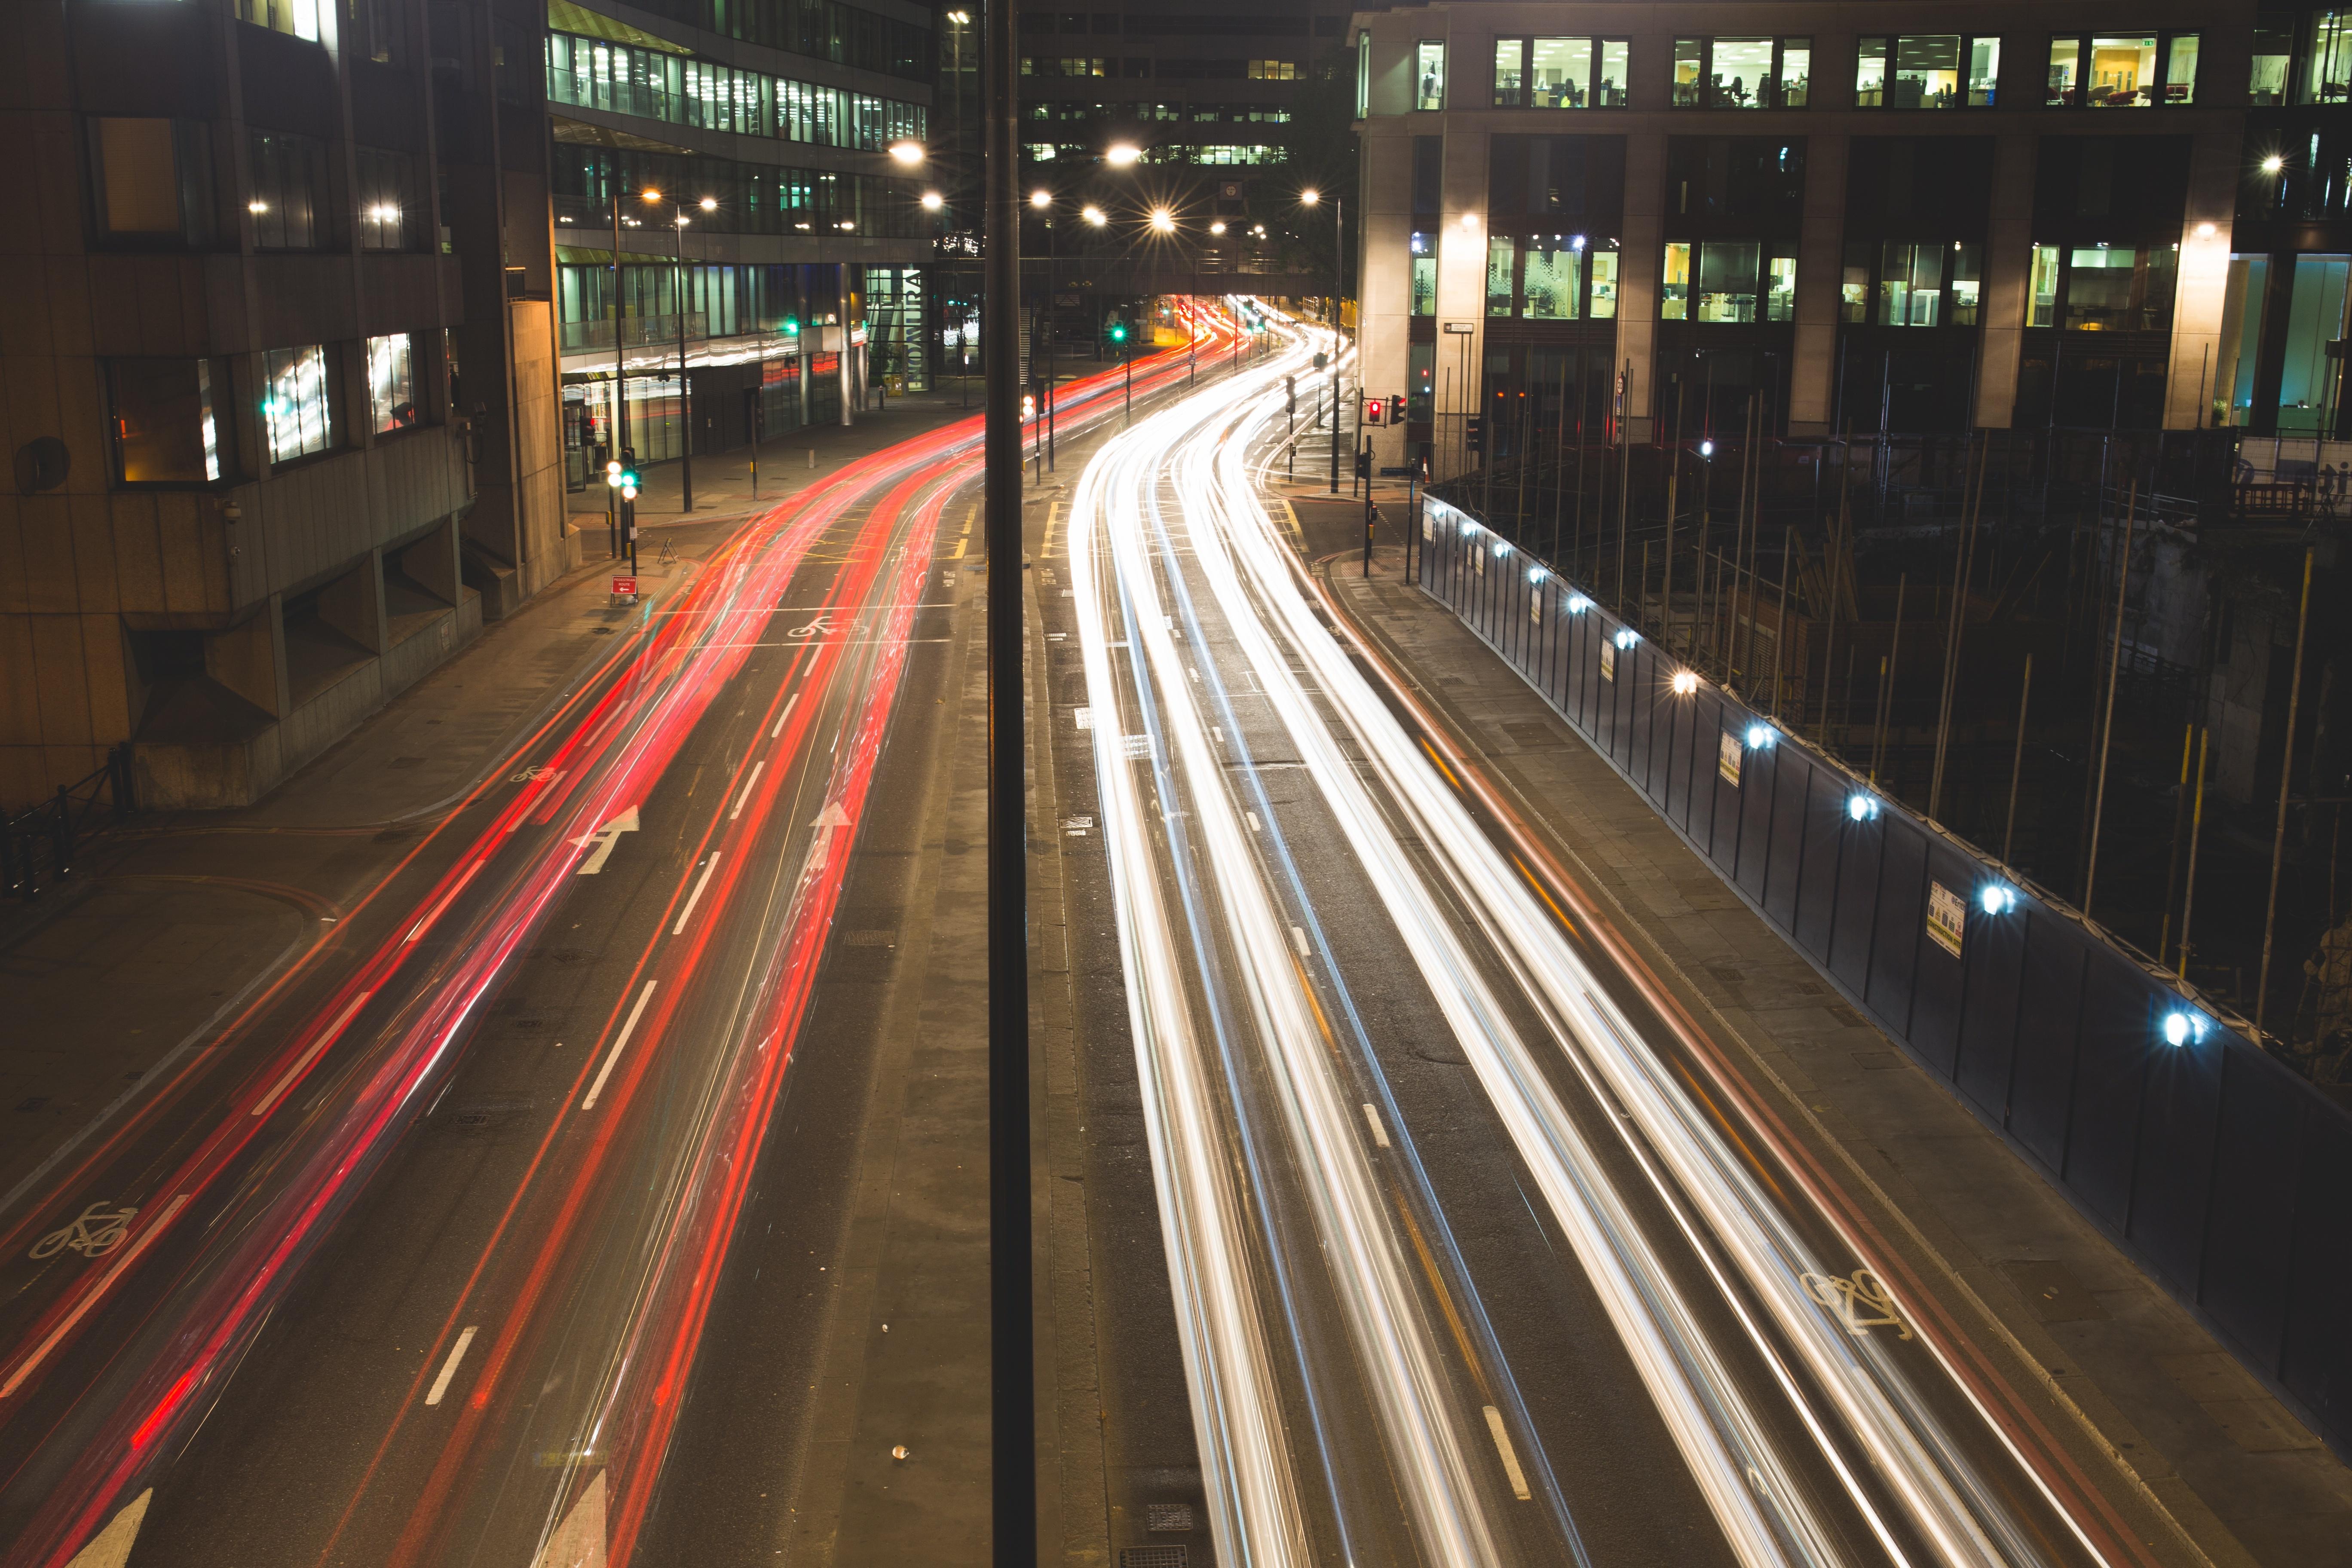 negative-space-city-traffic-night.jpg